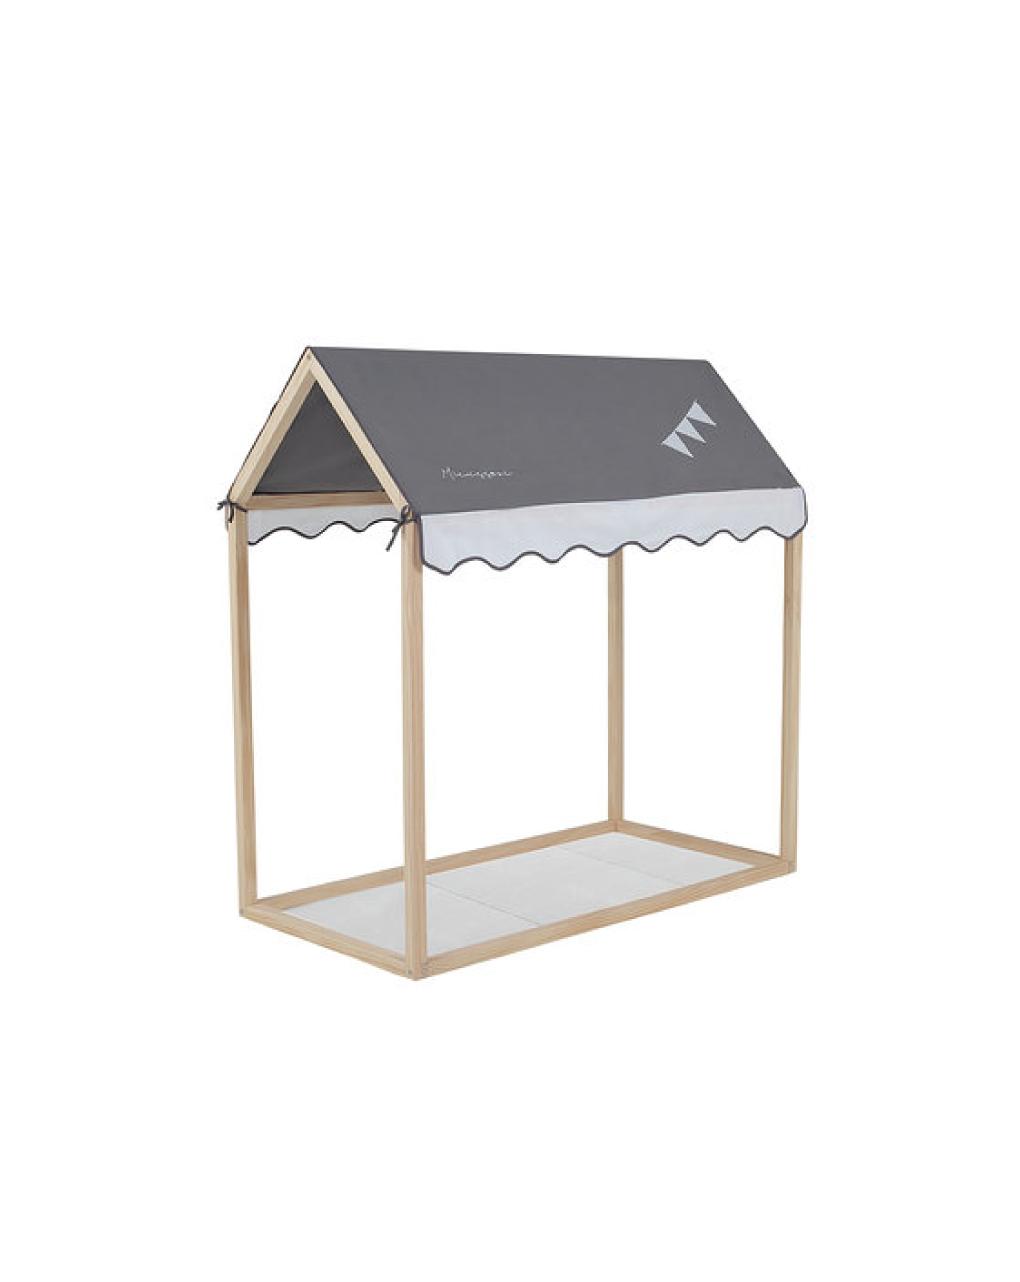 Tipi house tetto magic - Micuna